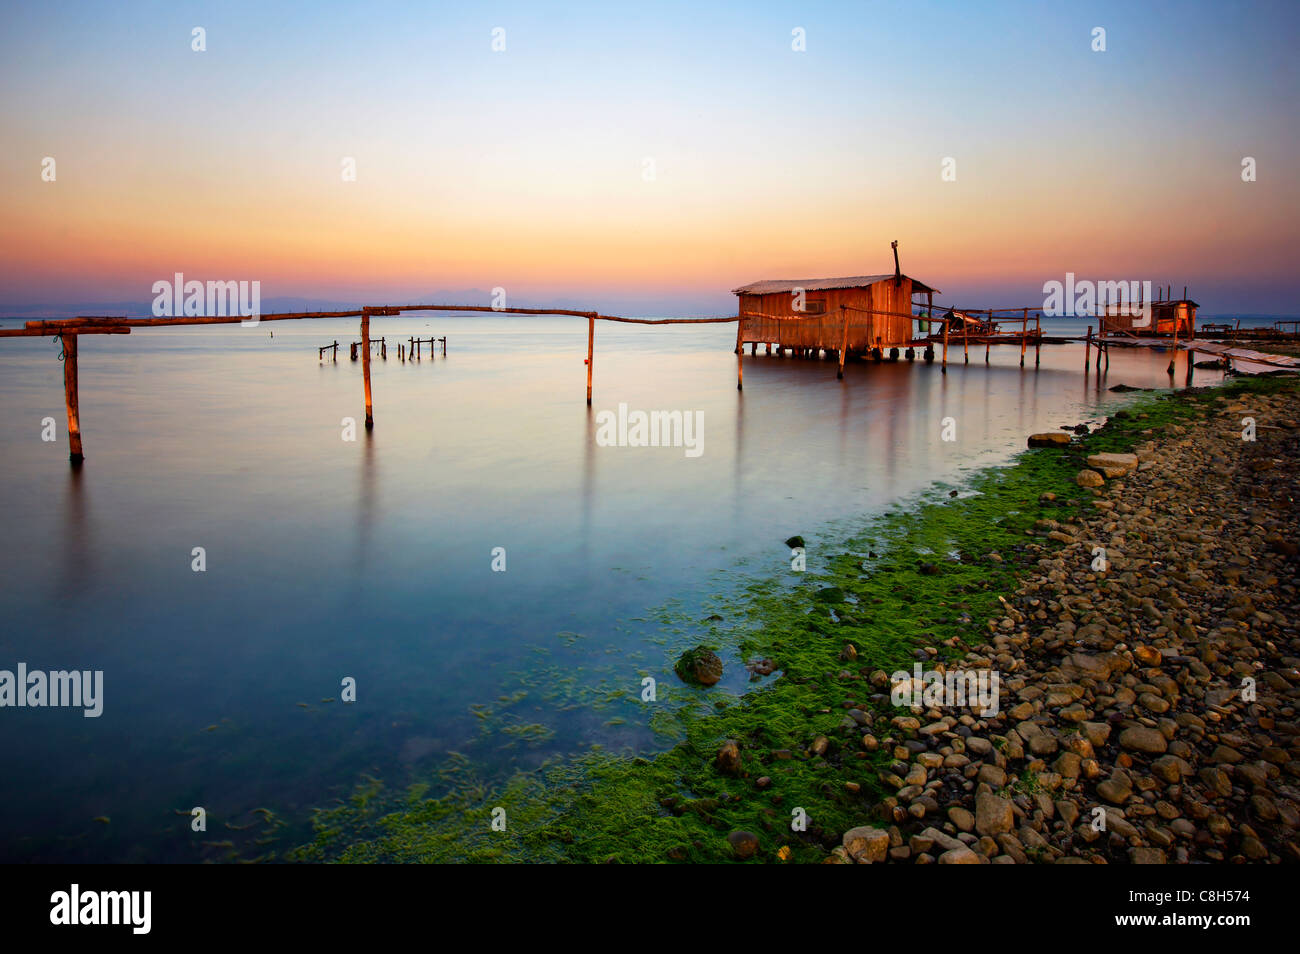 Stilt hut in the Delta of Axios (also know as 'Vardaris') river, Thessaloniki, Macedonia, Greece - Stock Image